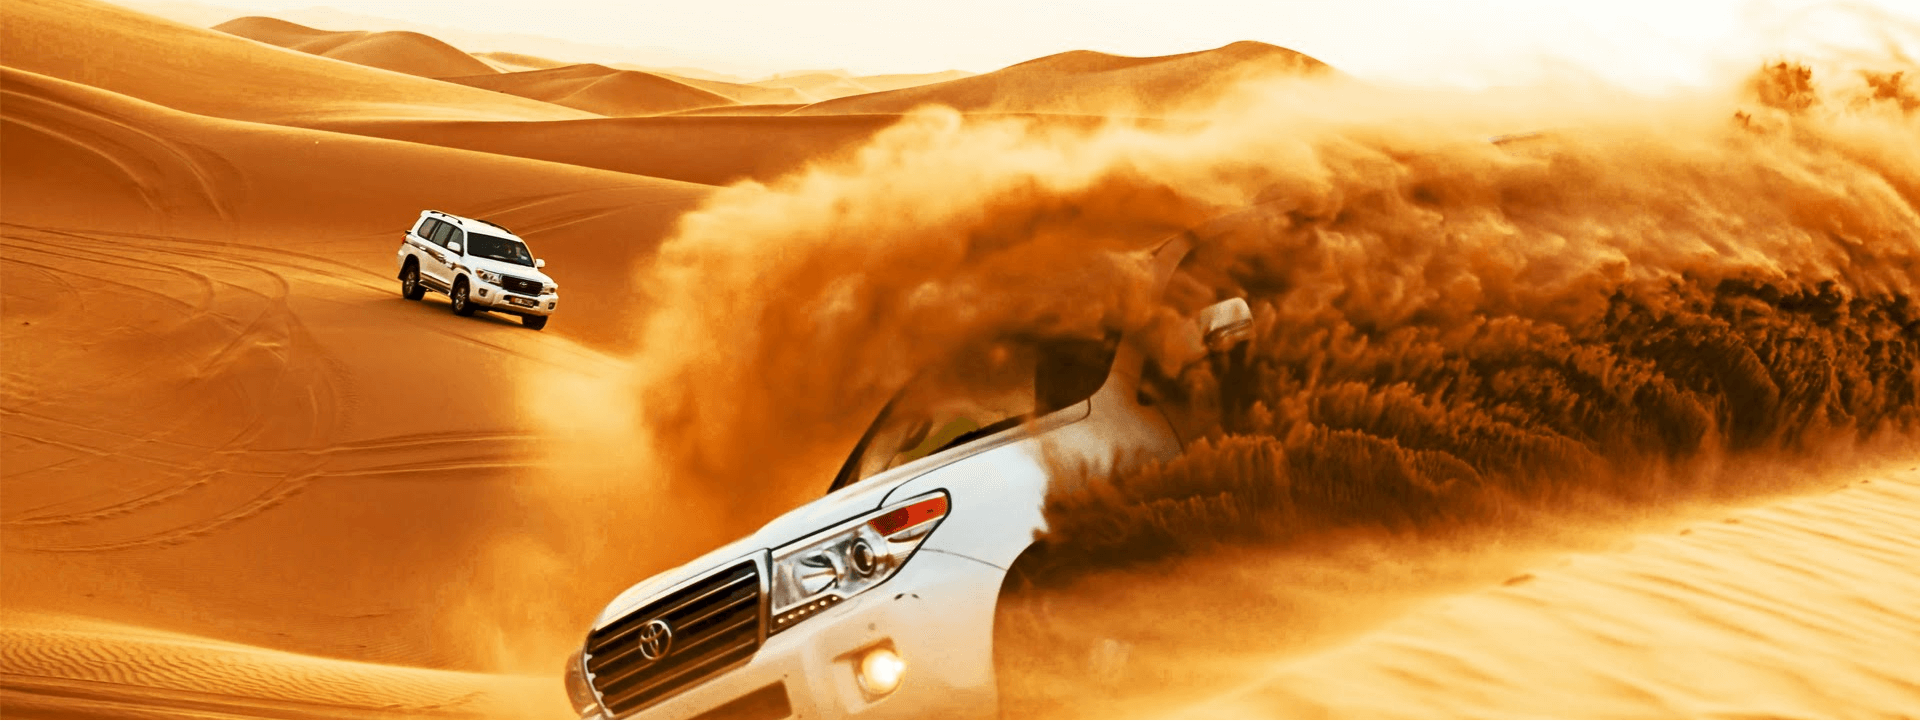 Morning Desert Safari in Dubai Tour